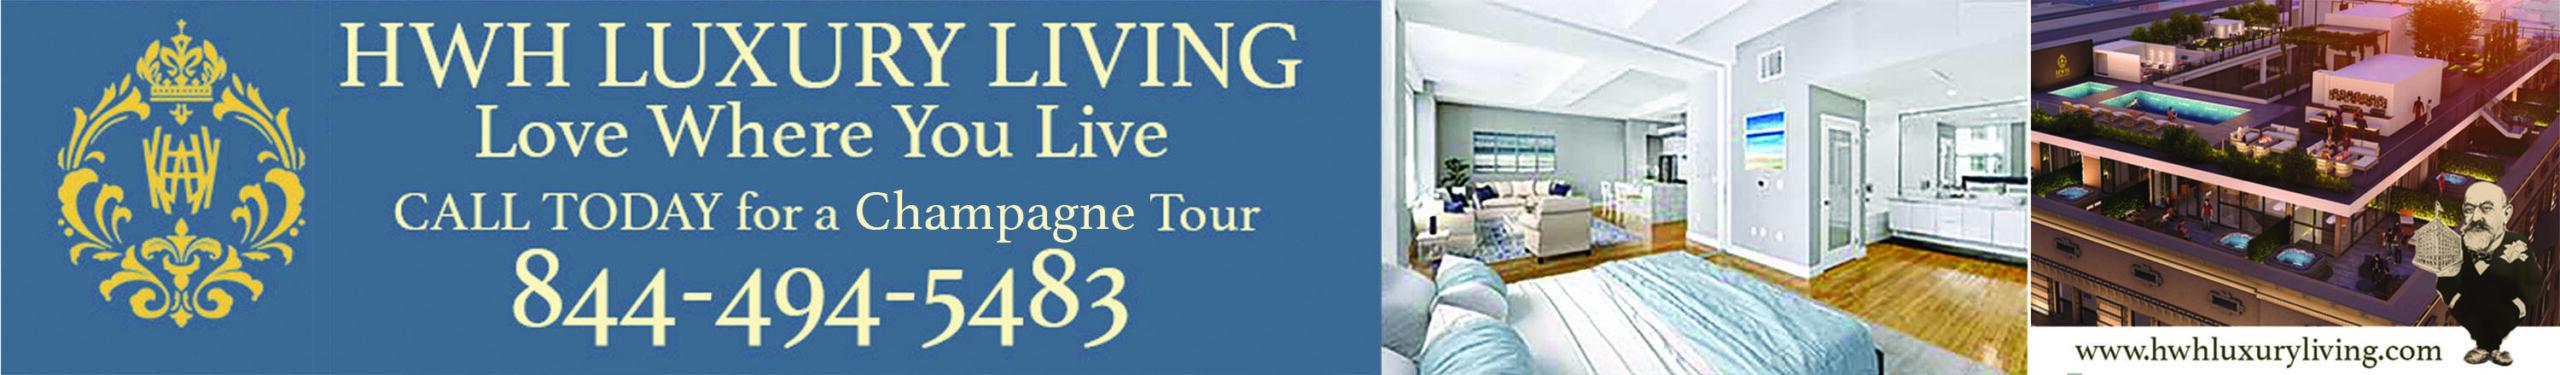 hwh luxury living banner